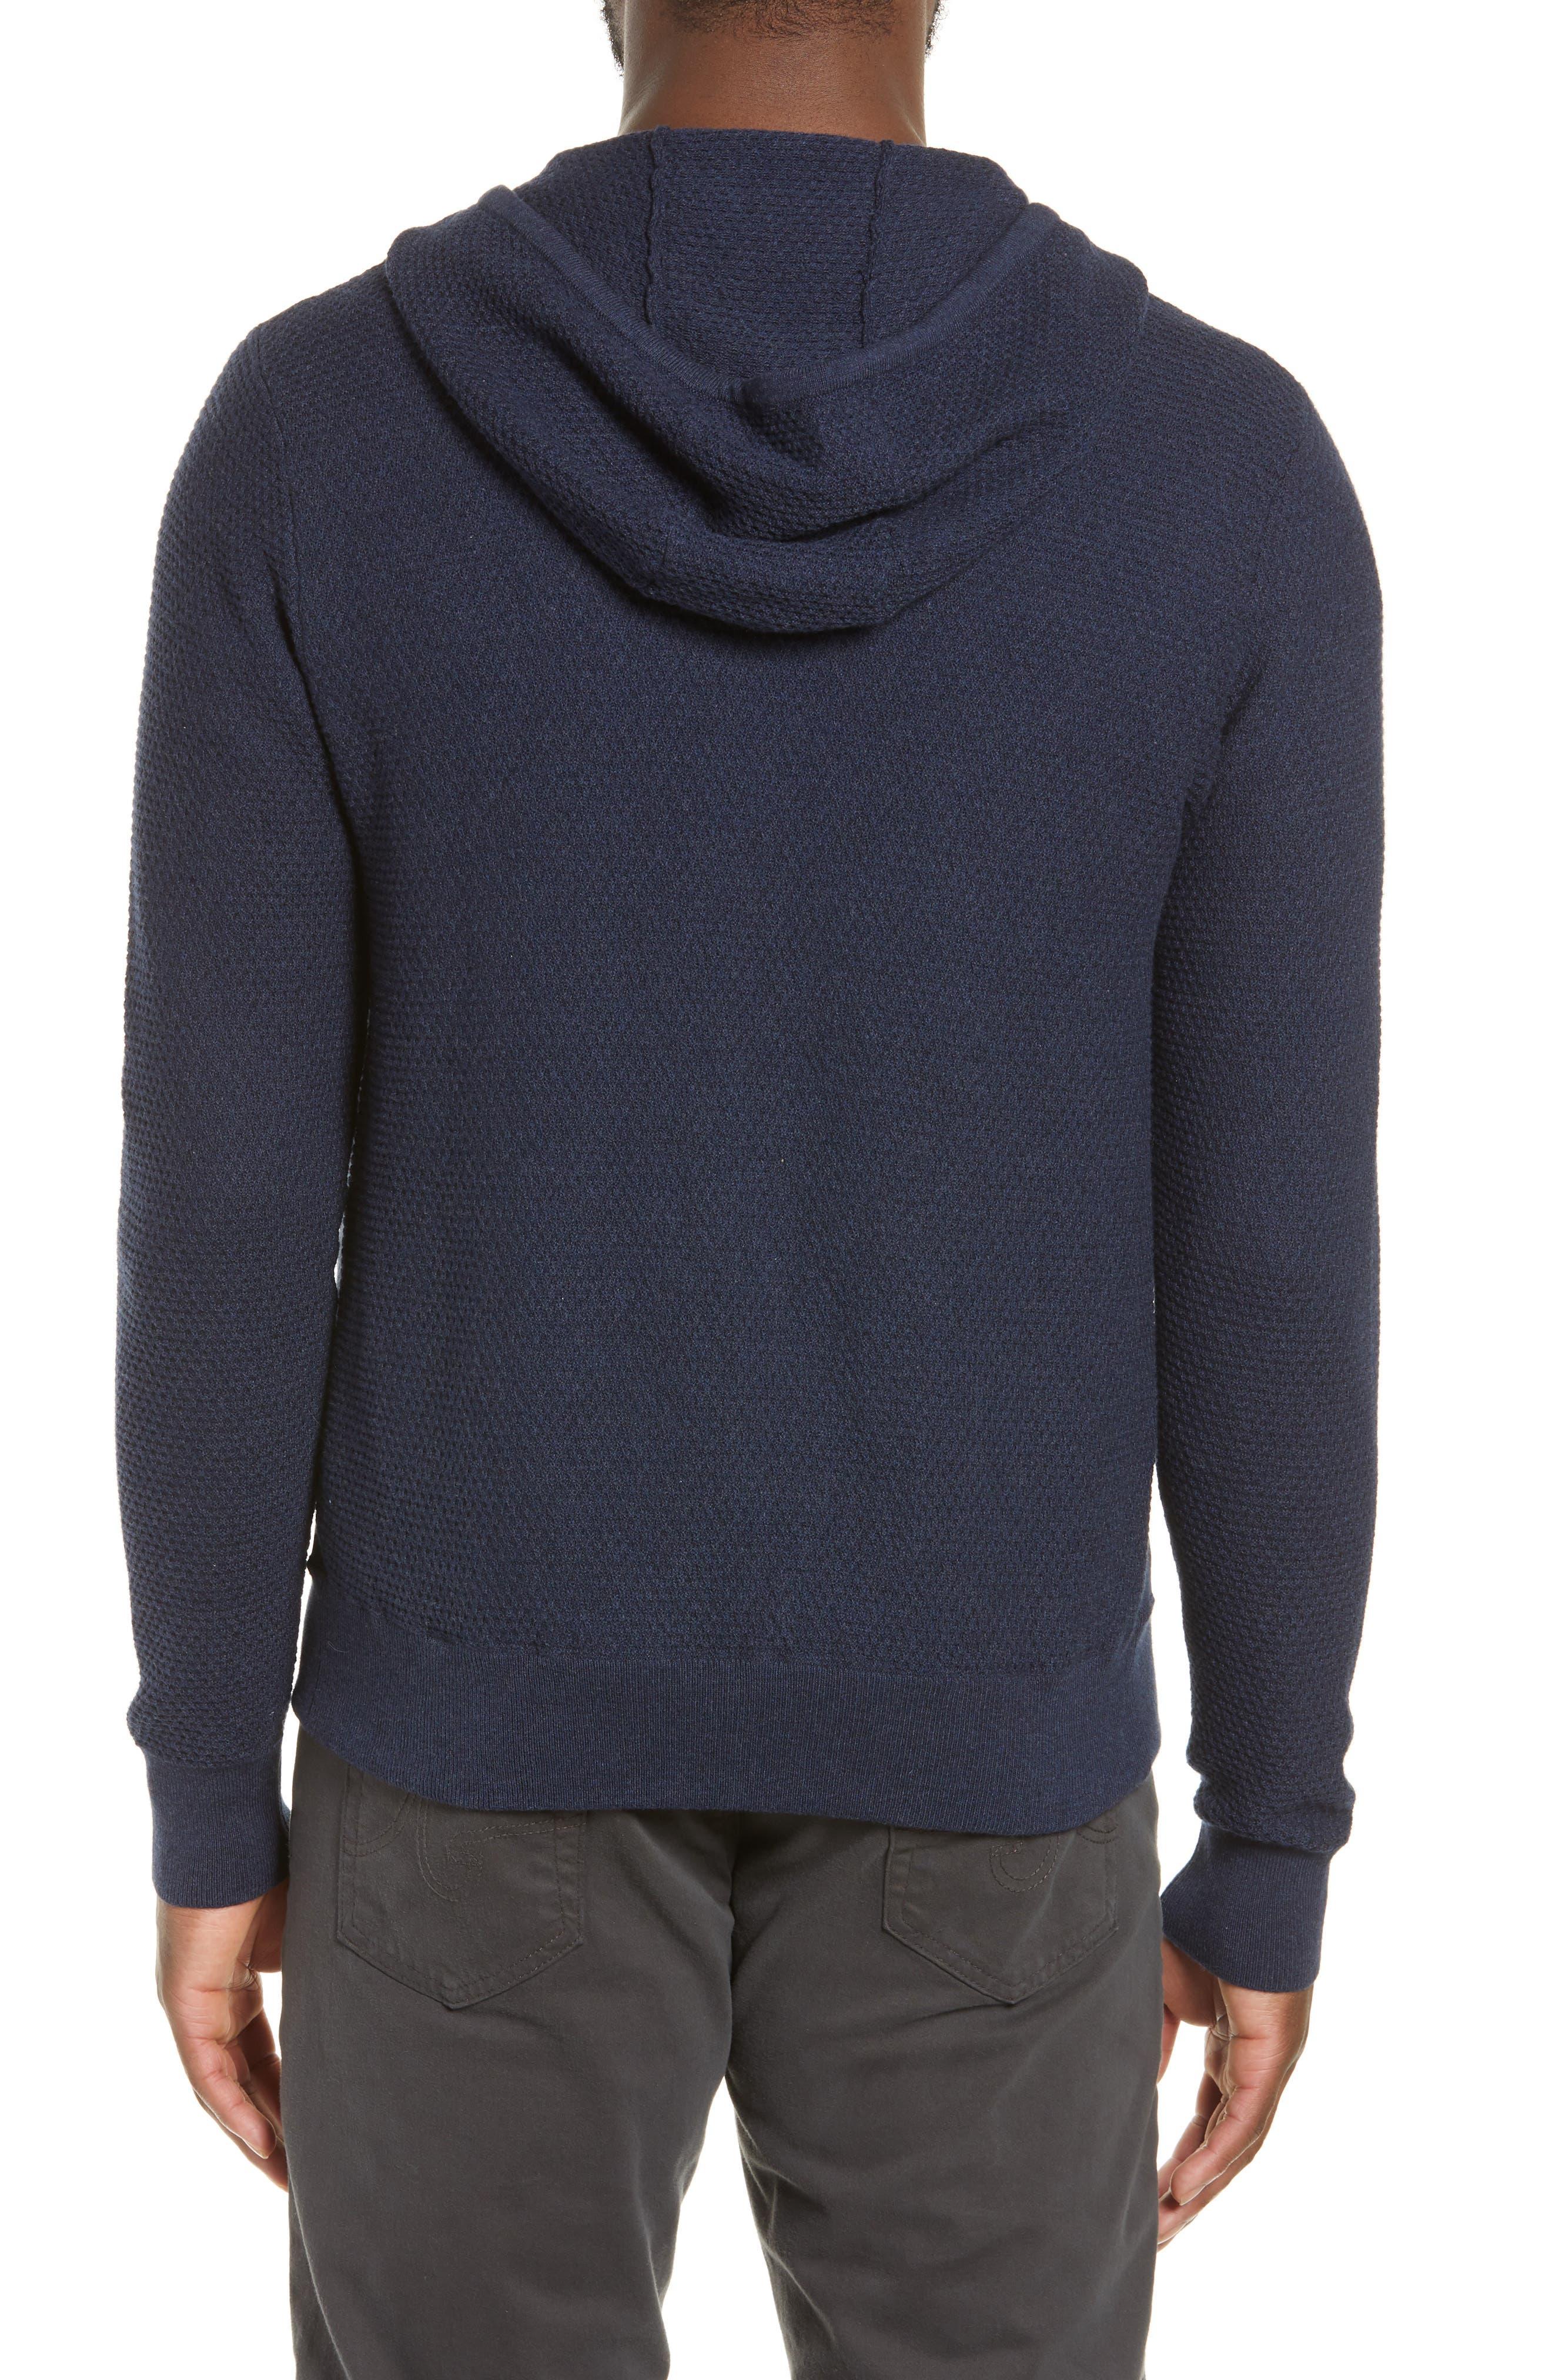 ZACHARY PRELL, Cedarhurst Hooded Zip Sweater, Alternate thumbnail 2, color, NAVY